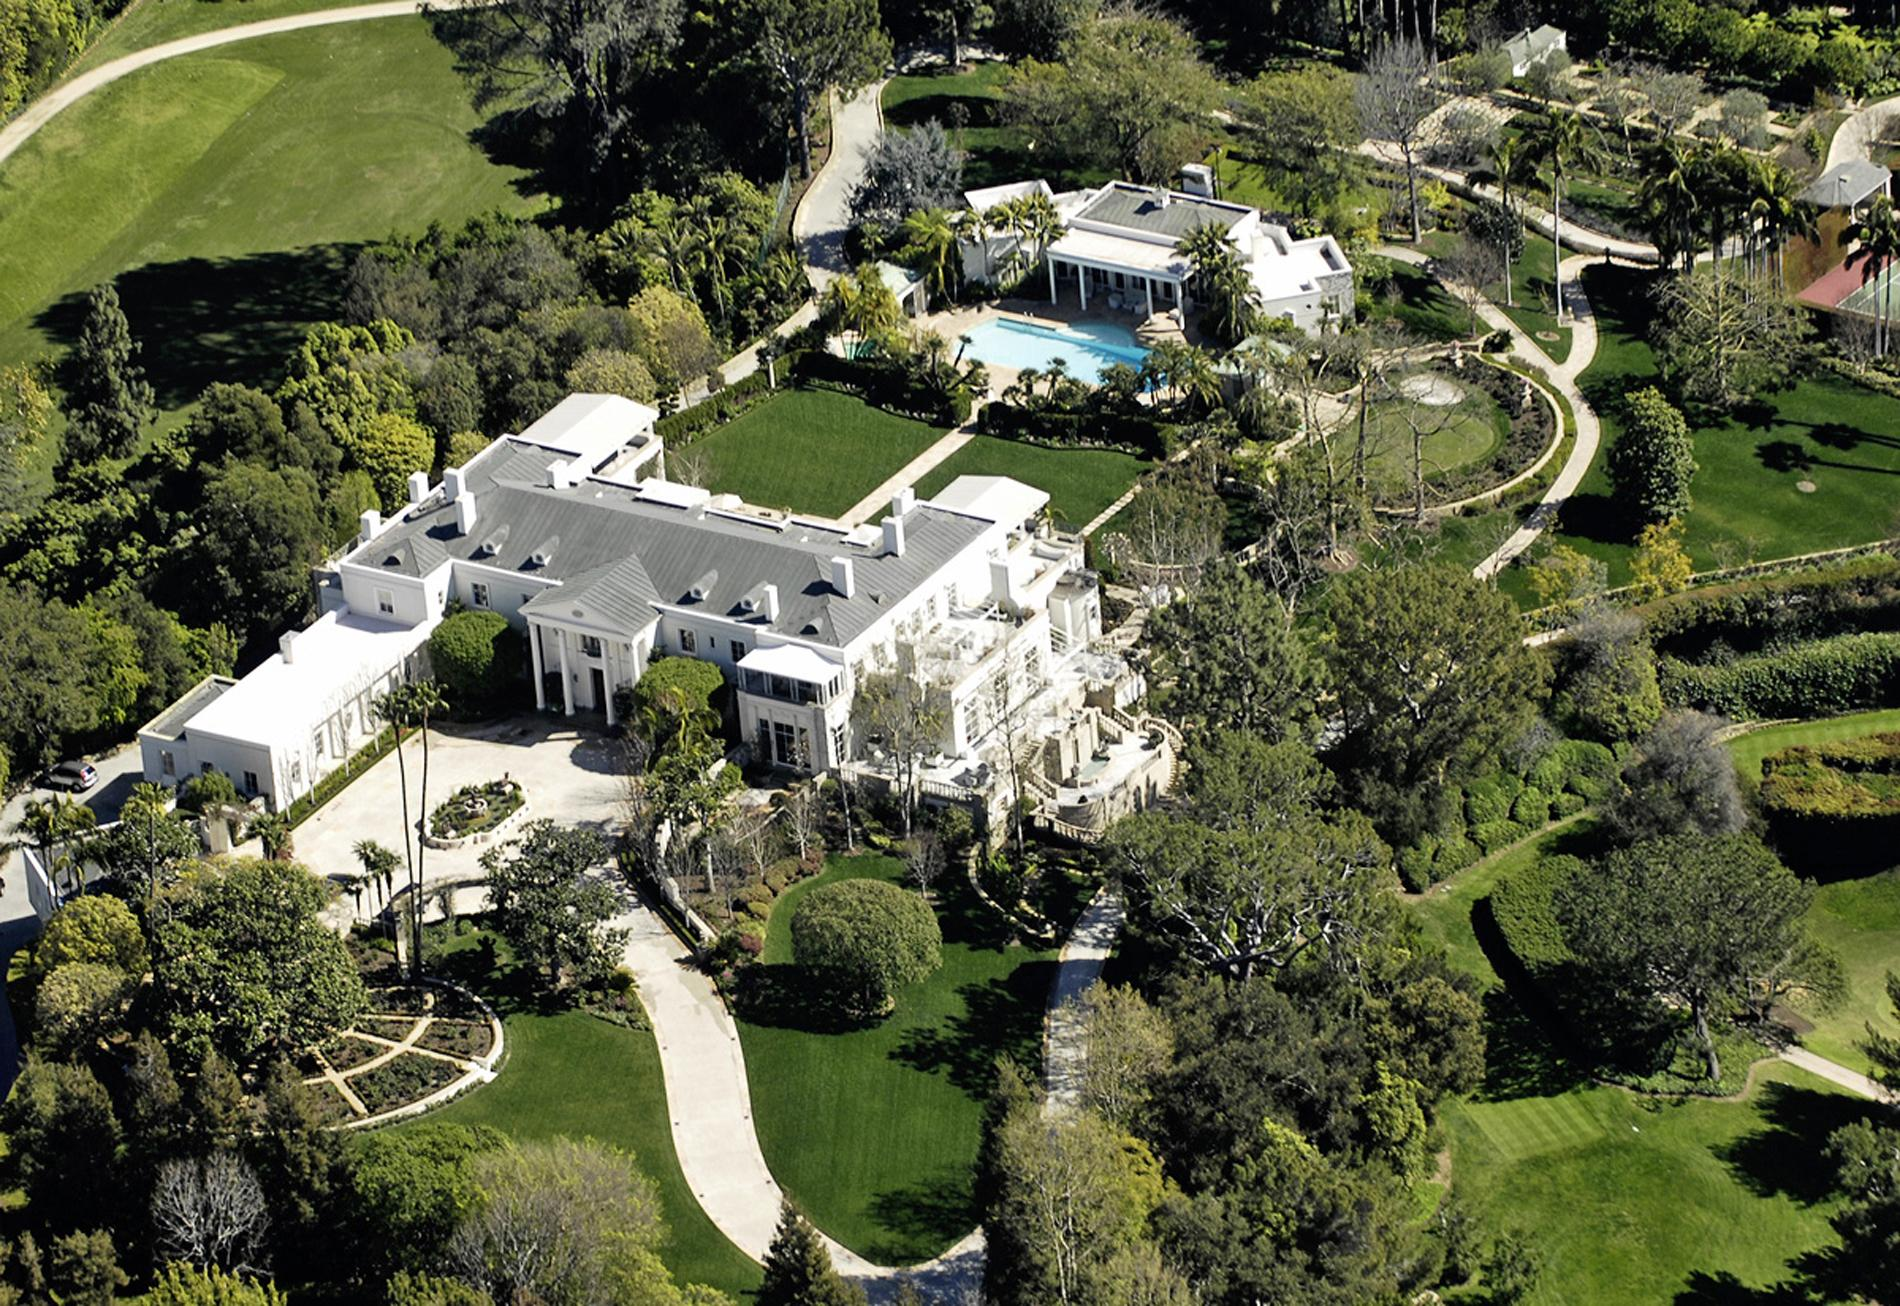 Le Scandaleux Destin De La Dynastie Hilton Madame Figaro